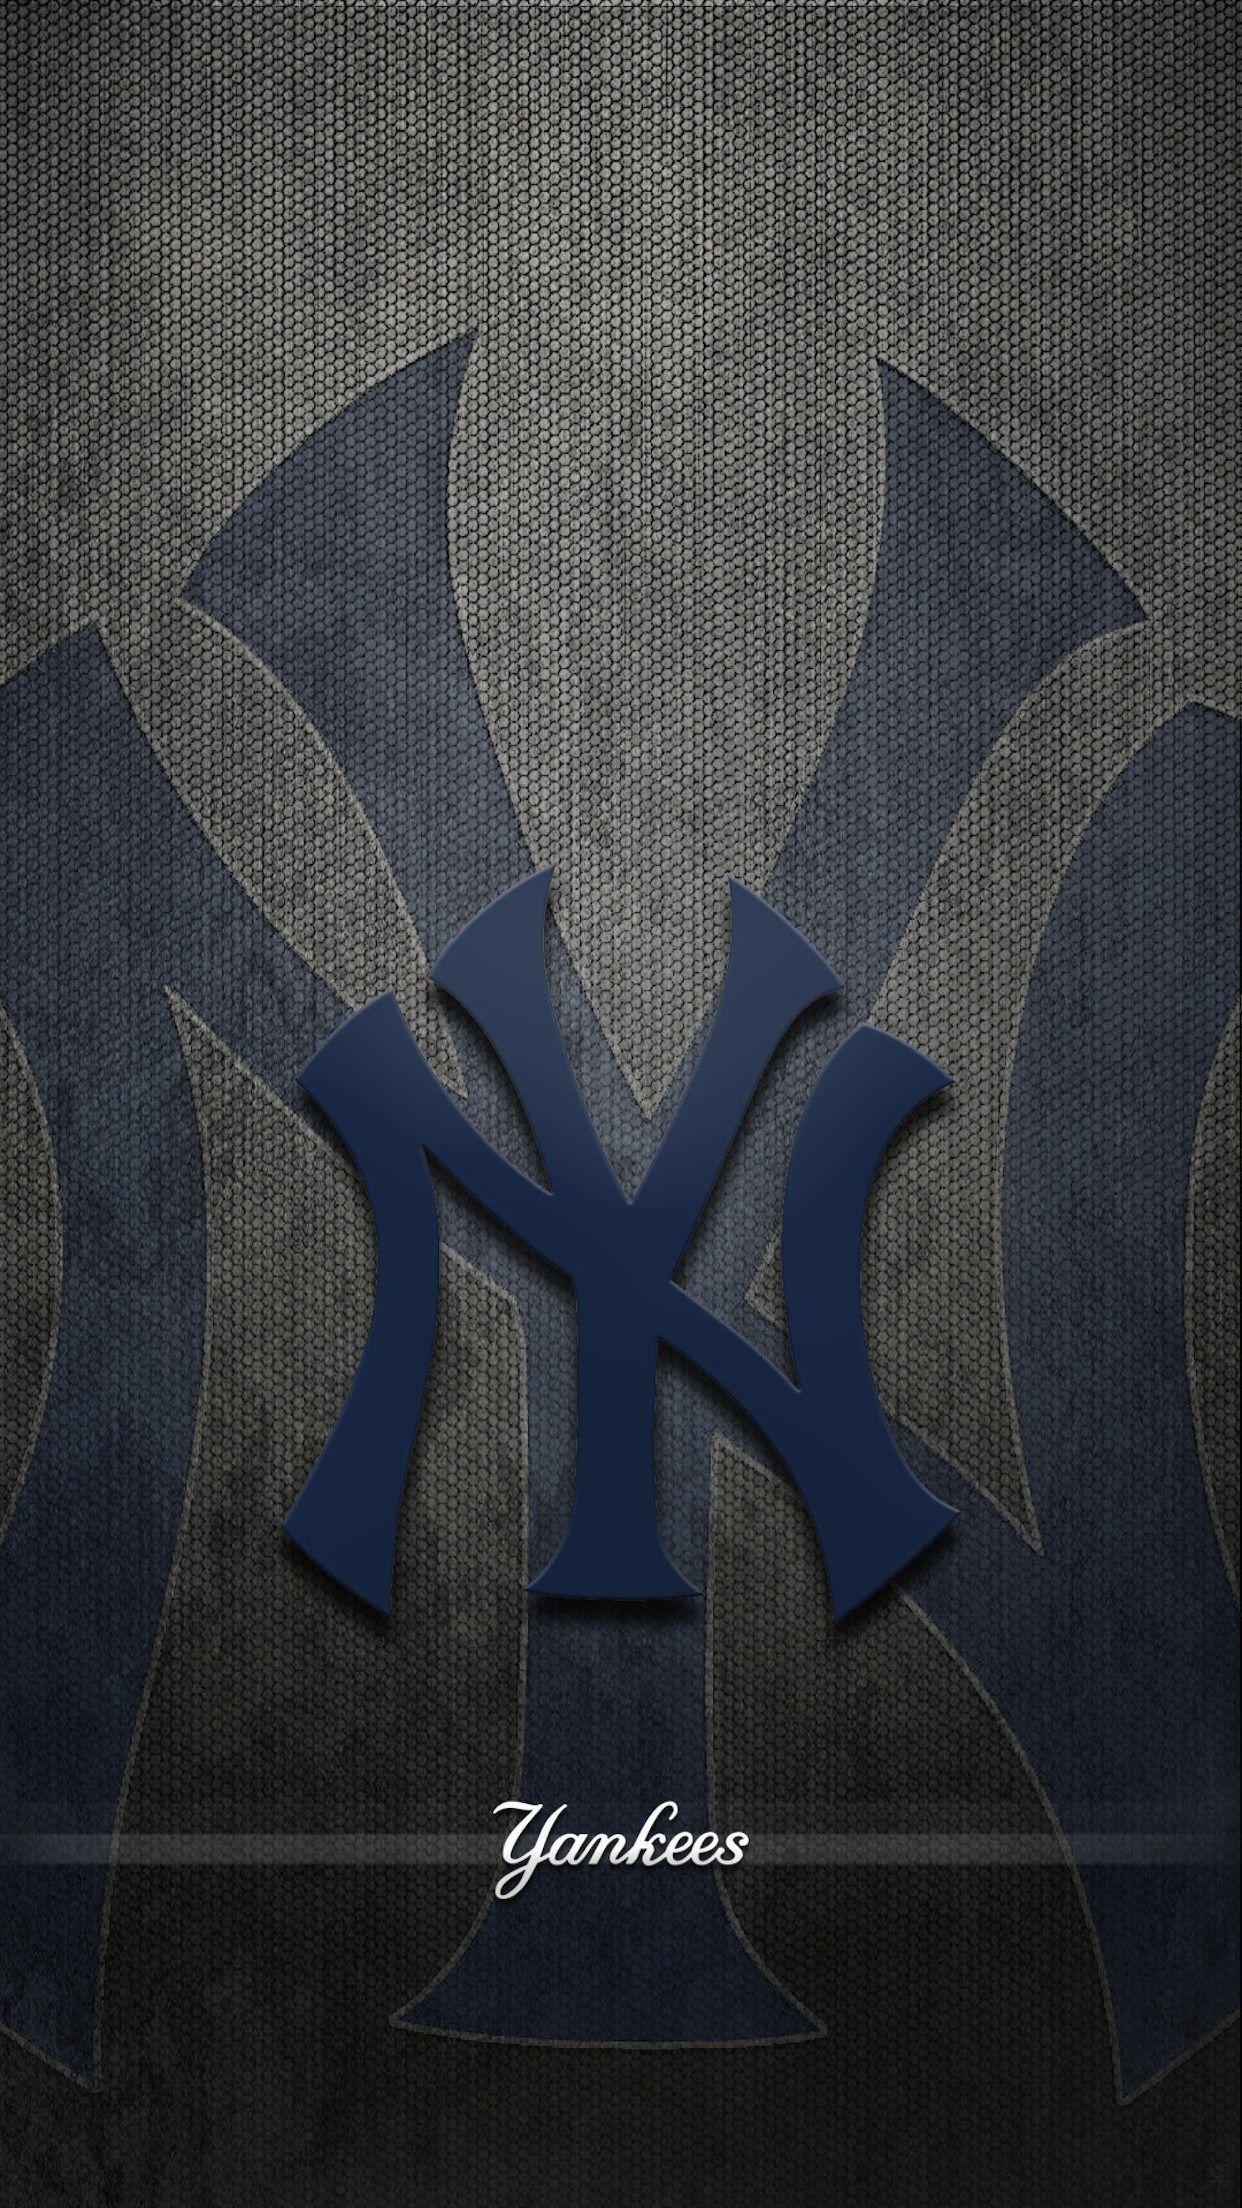 Beautiful New York Yankees Wallpaper Iphone Baseball Wallpaper New York Yankees Logo New York Yankees